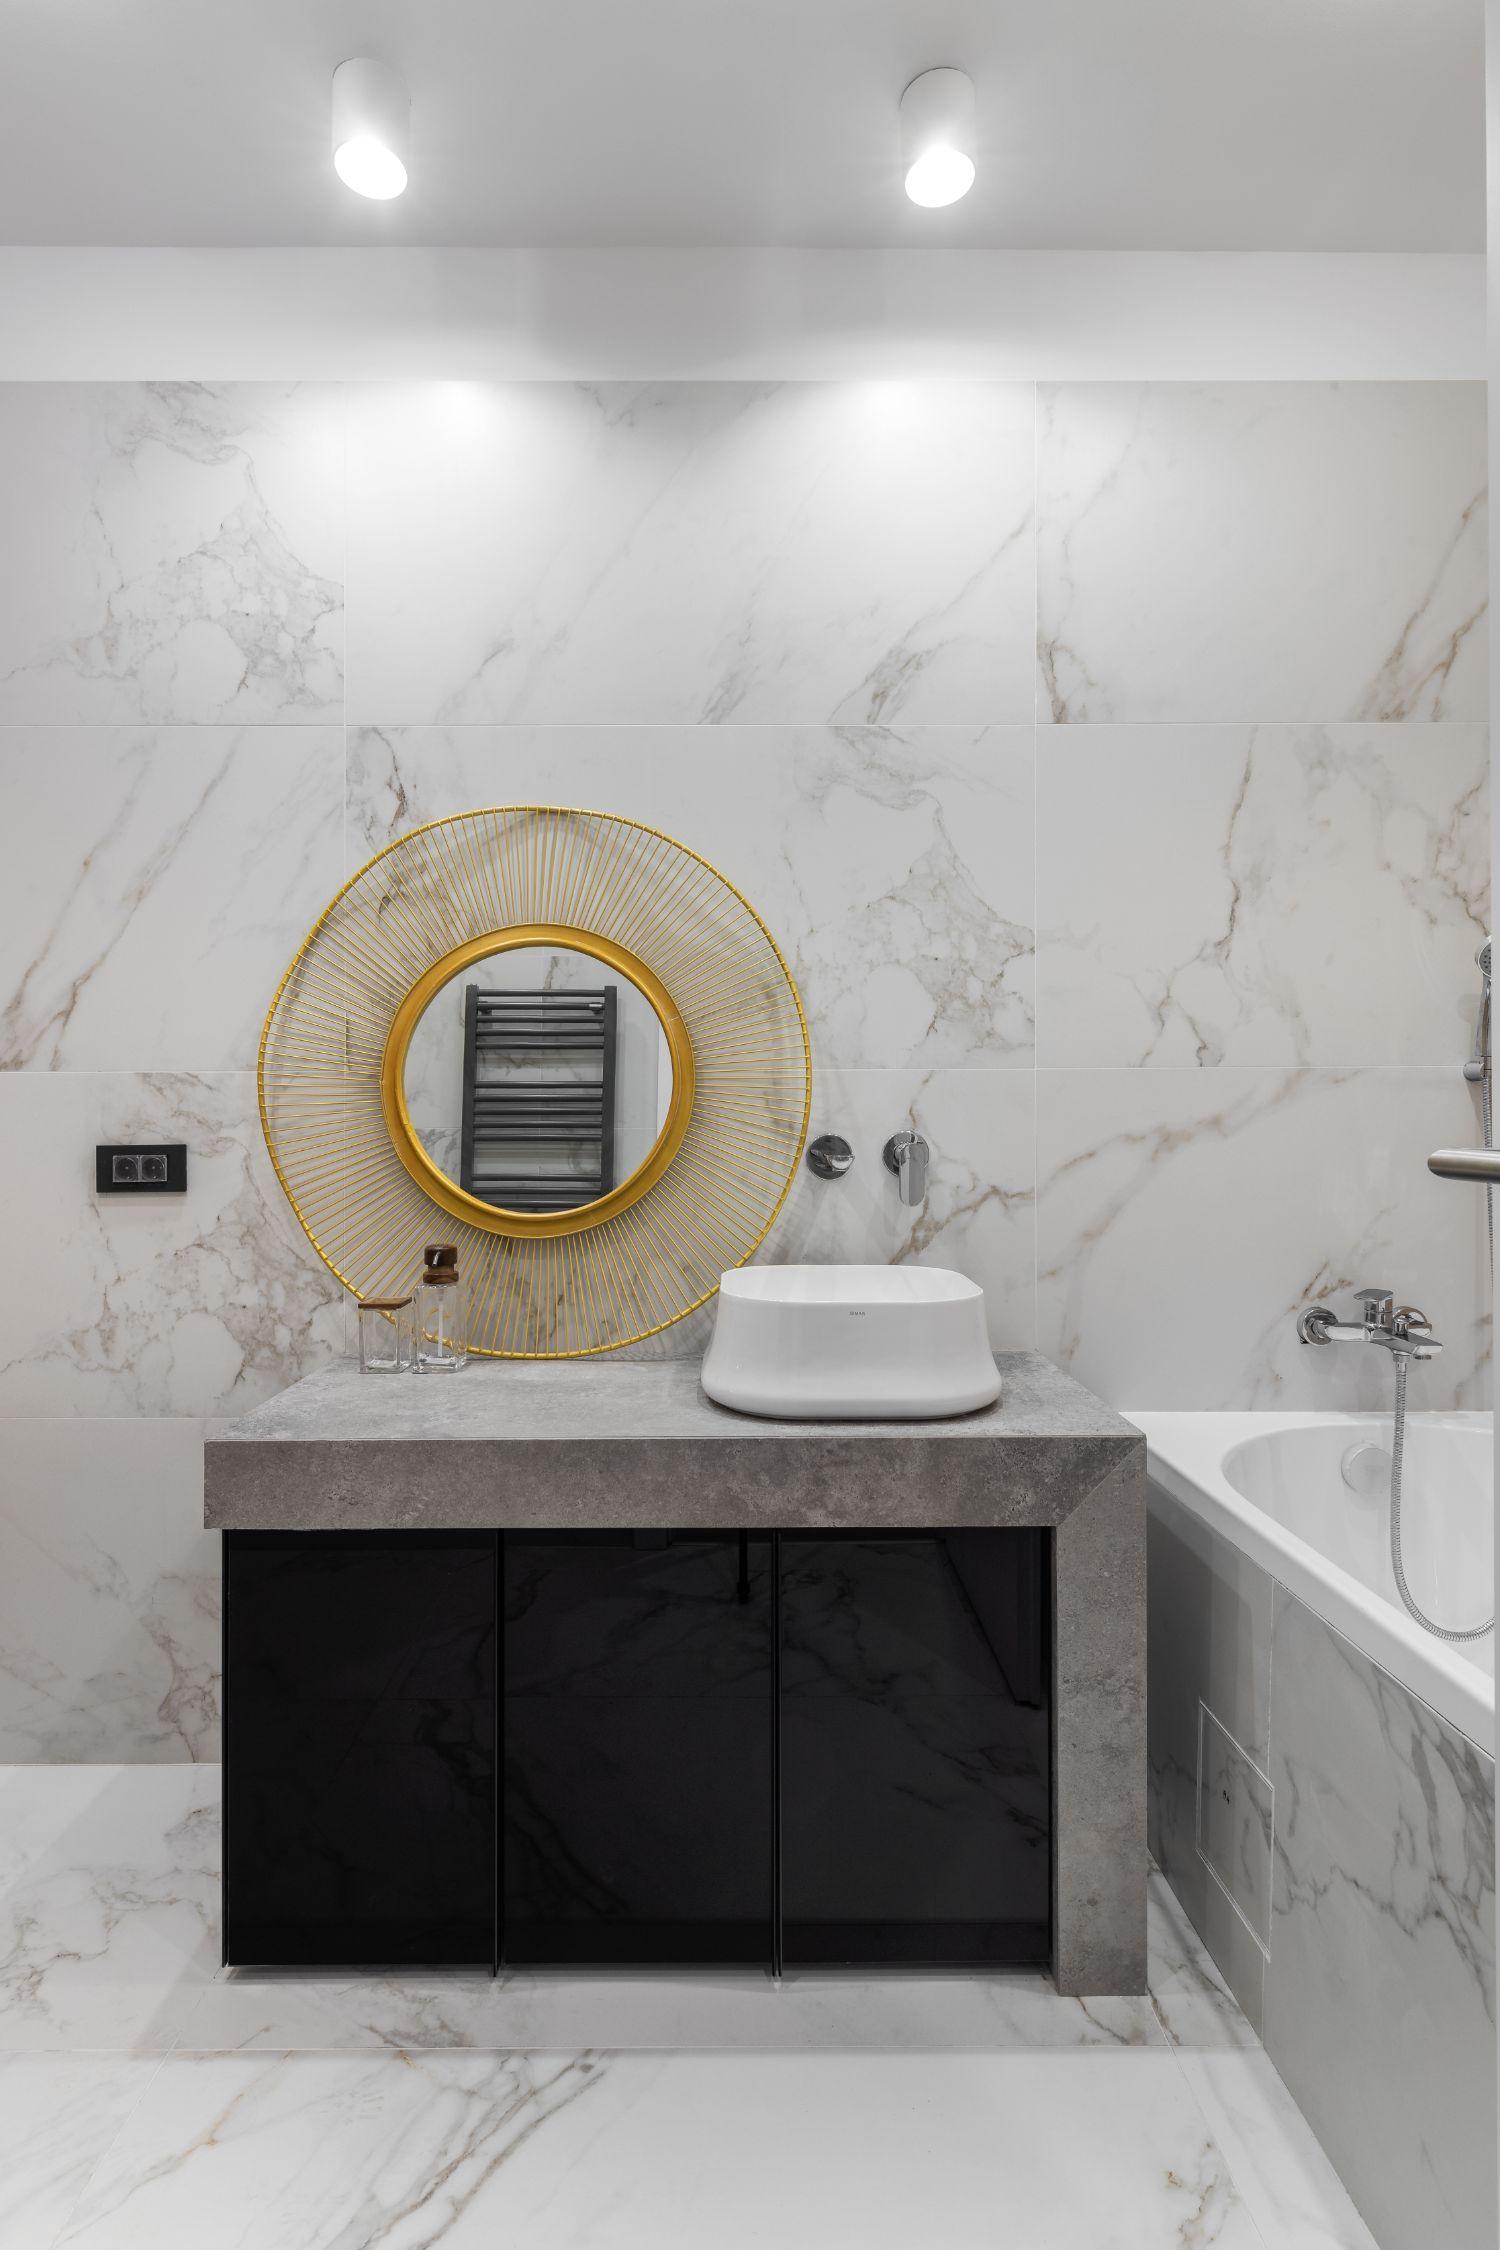 Baie marmura - design interior Pure Mess Design